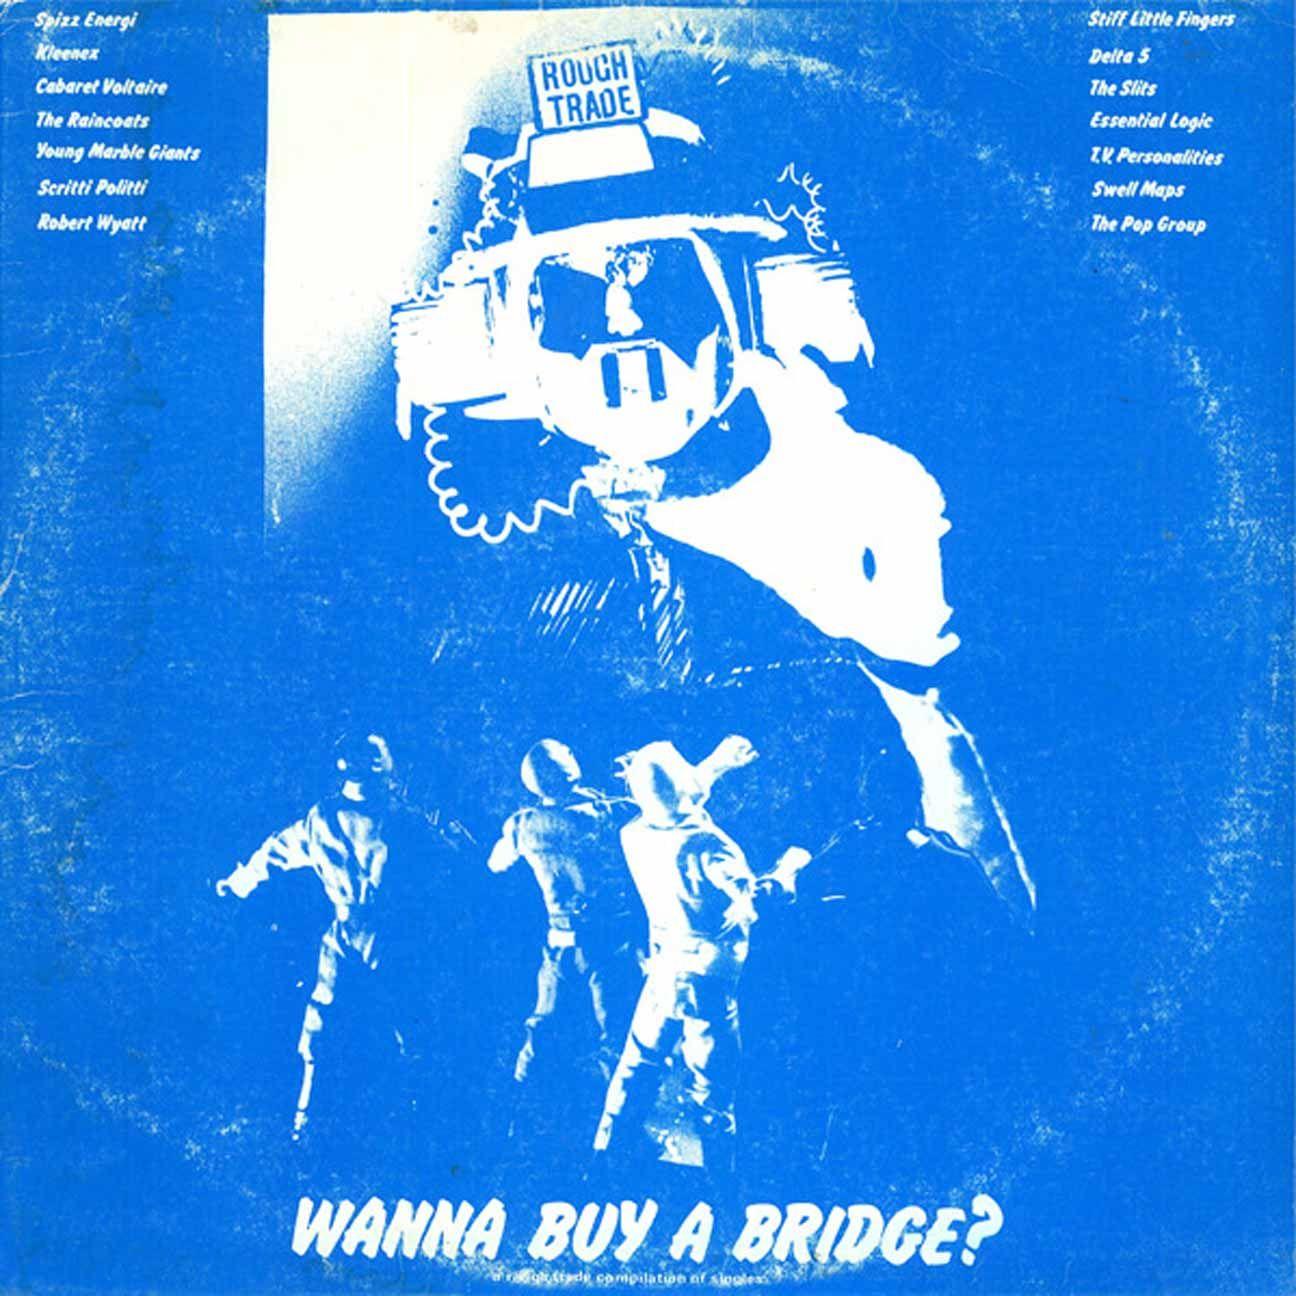 Wanna Buy A Bridge ? Rough Trade singles compilation.